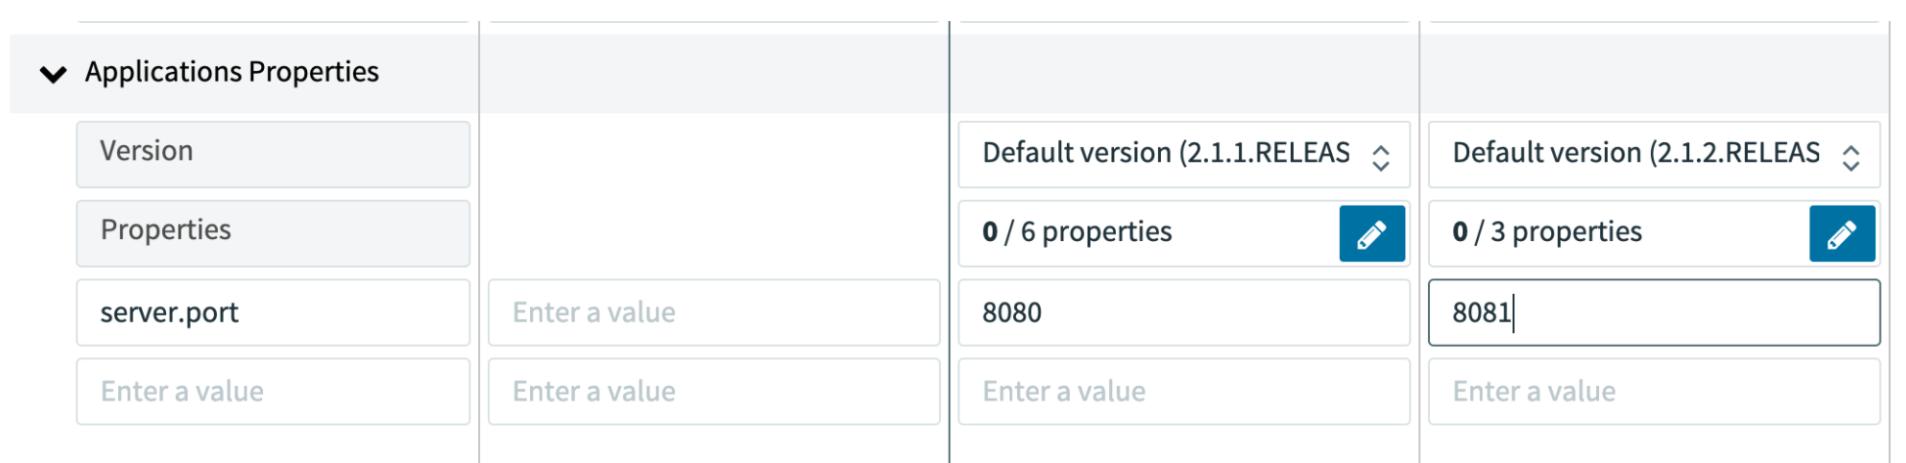 Applications Properties | server.port